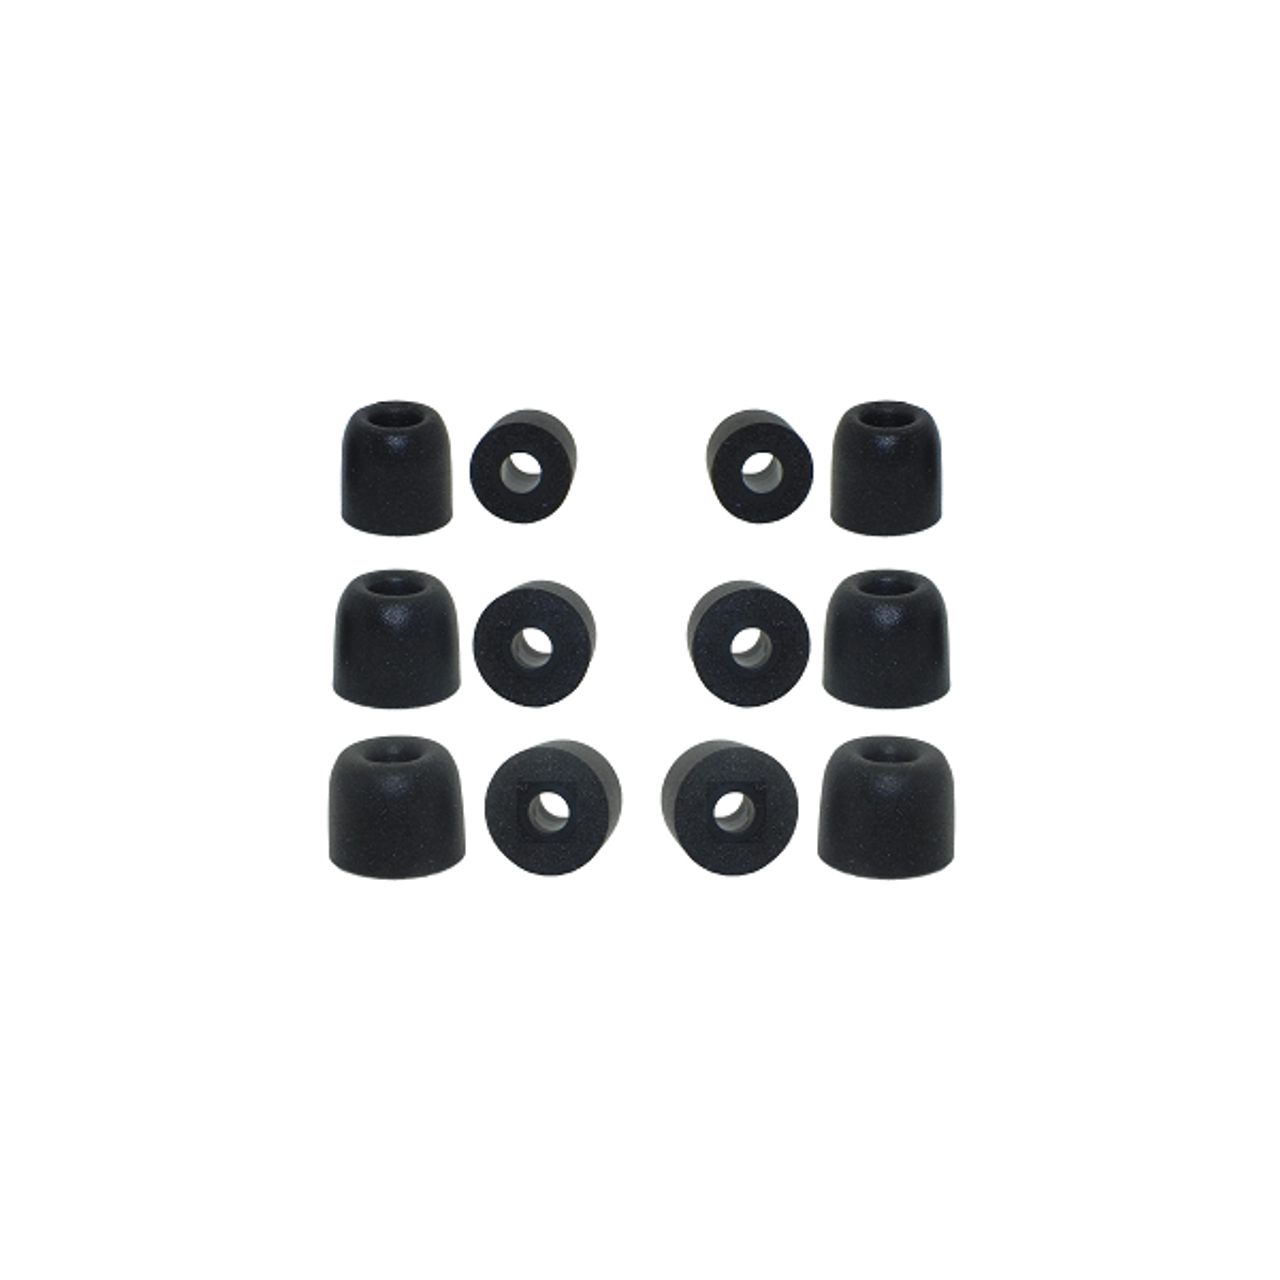 memory foam earbuds for Soundmagic earbuds